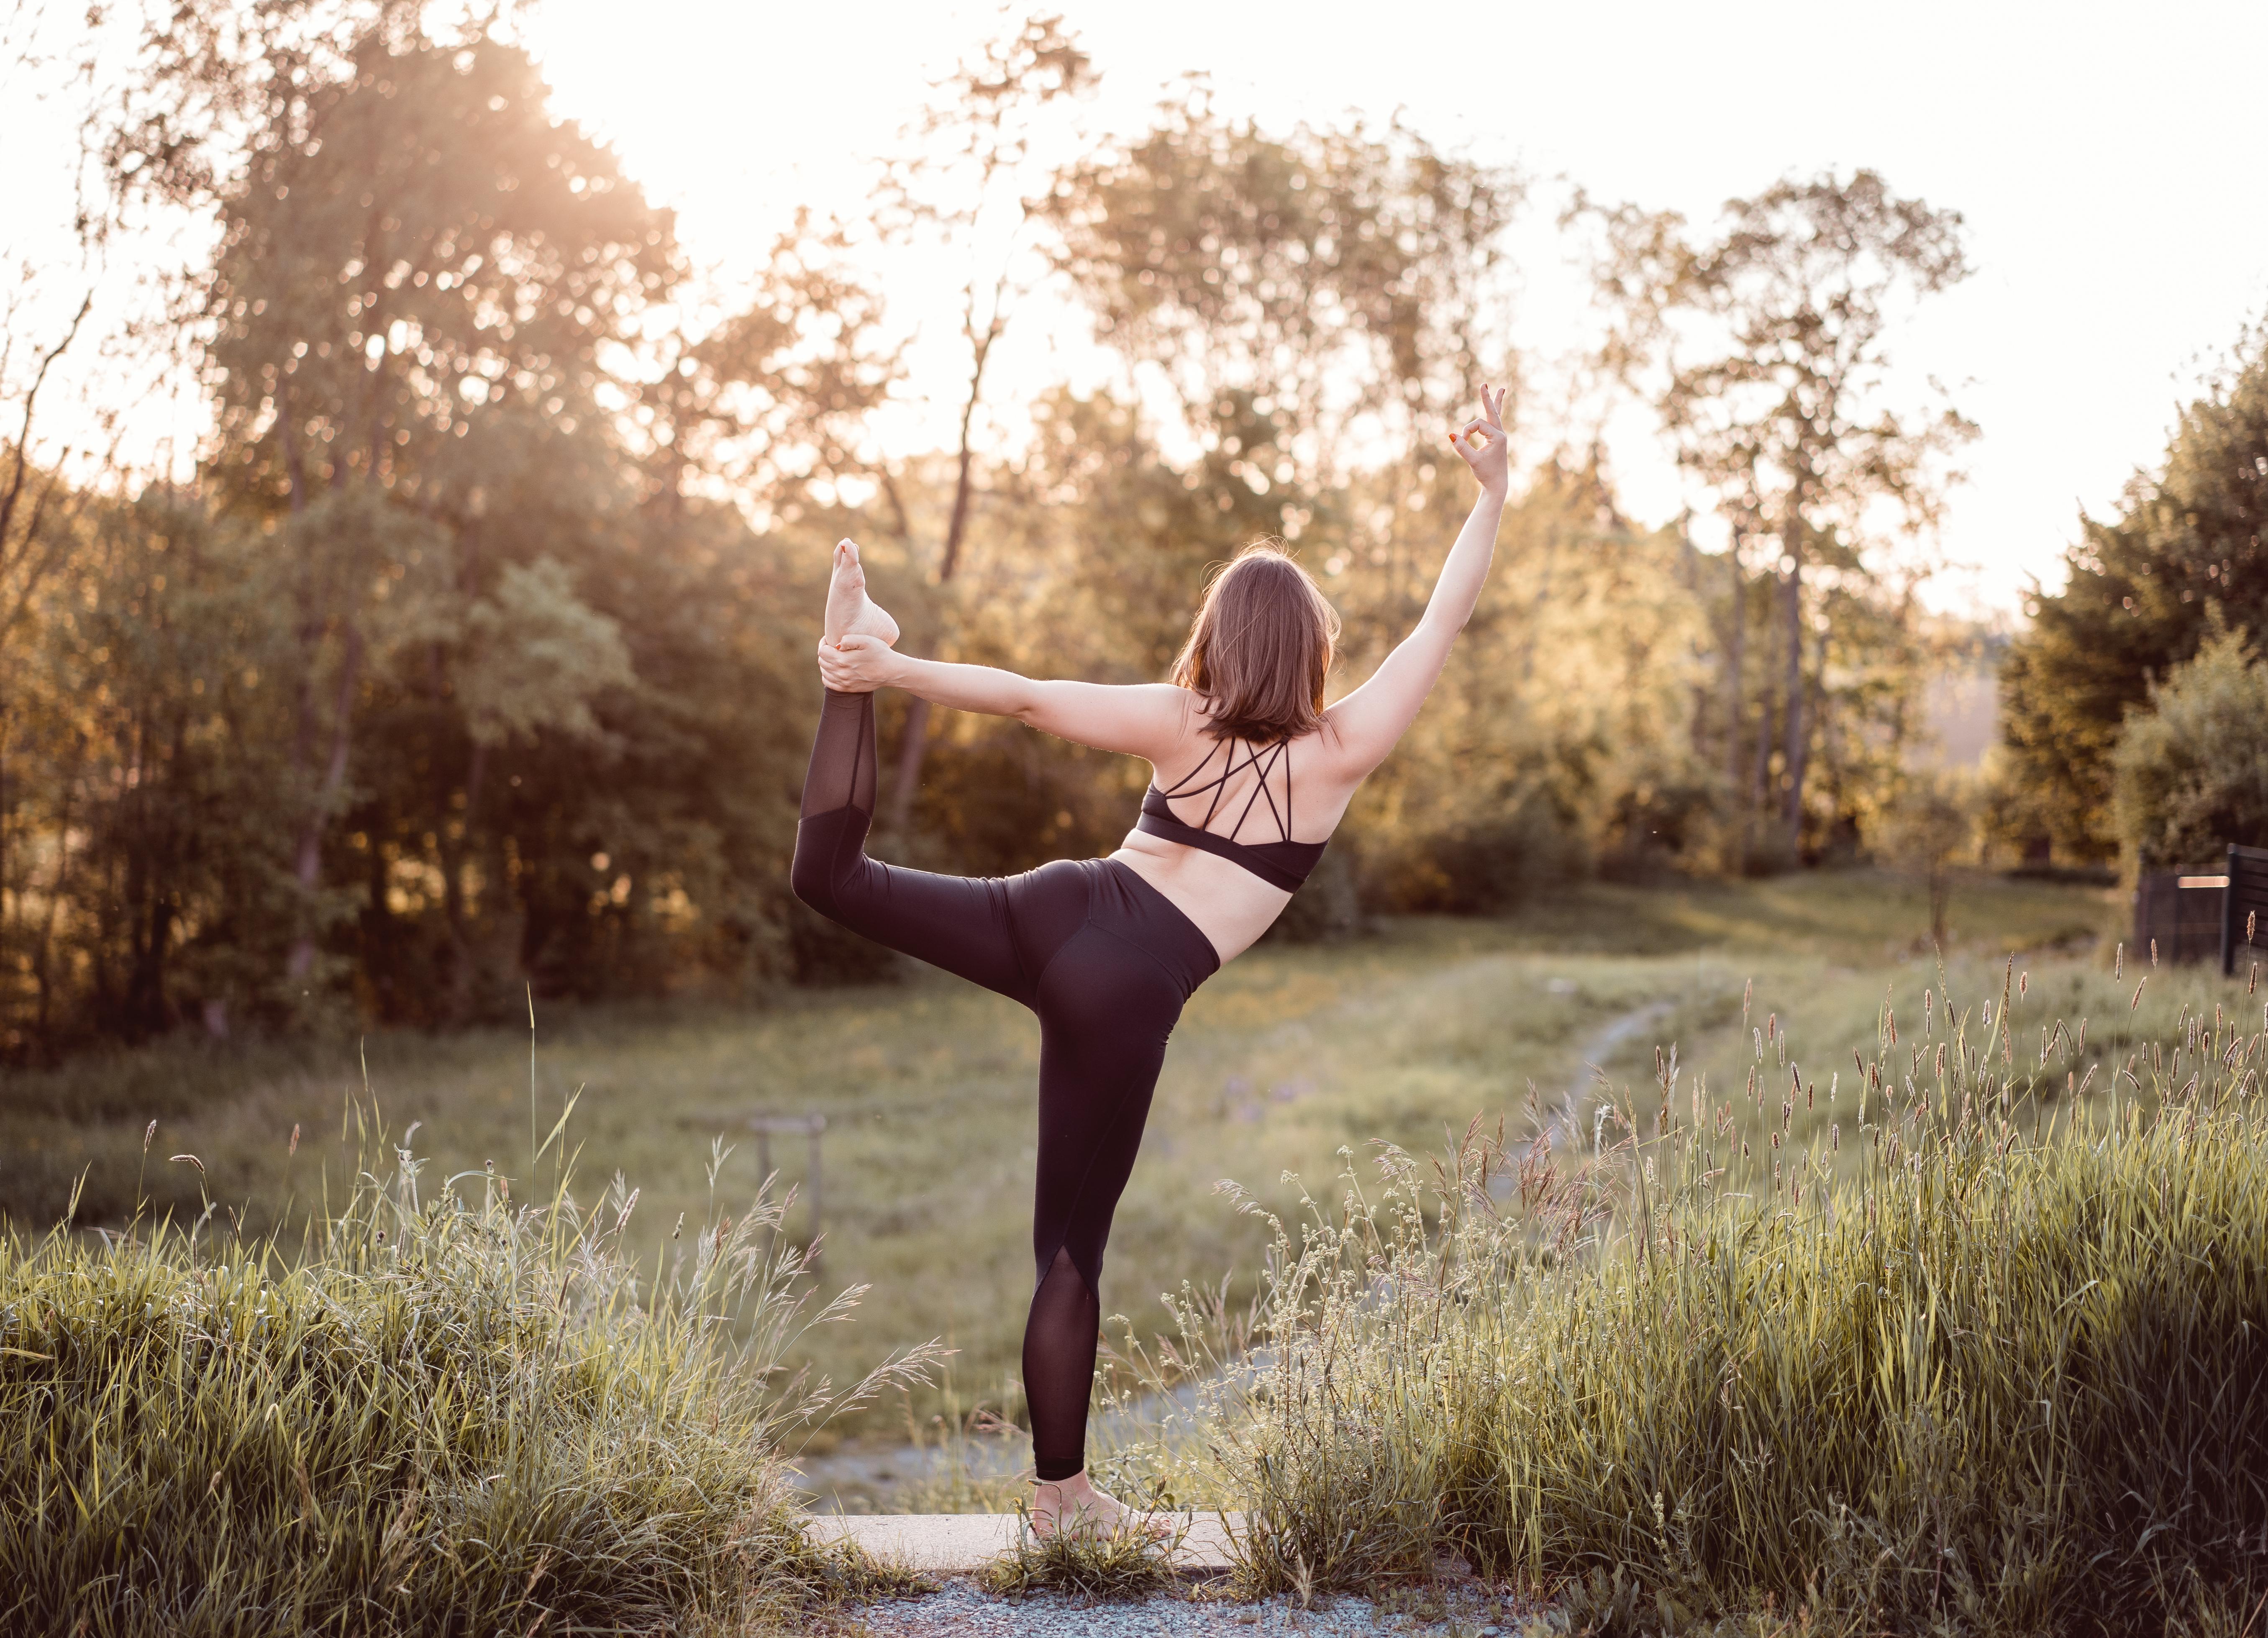 Der Traum vom Yoga: Amazing Amy lebt ihn!